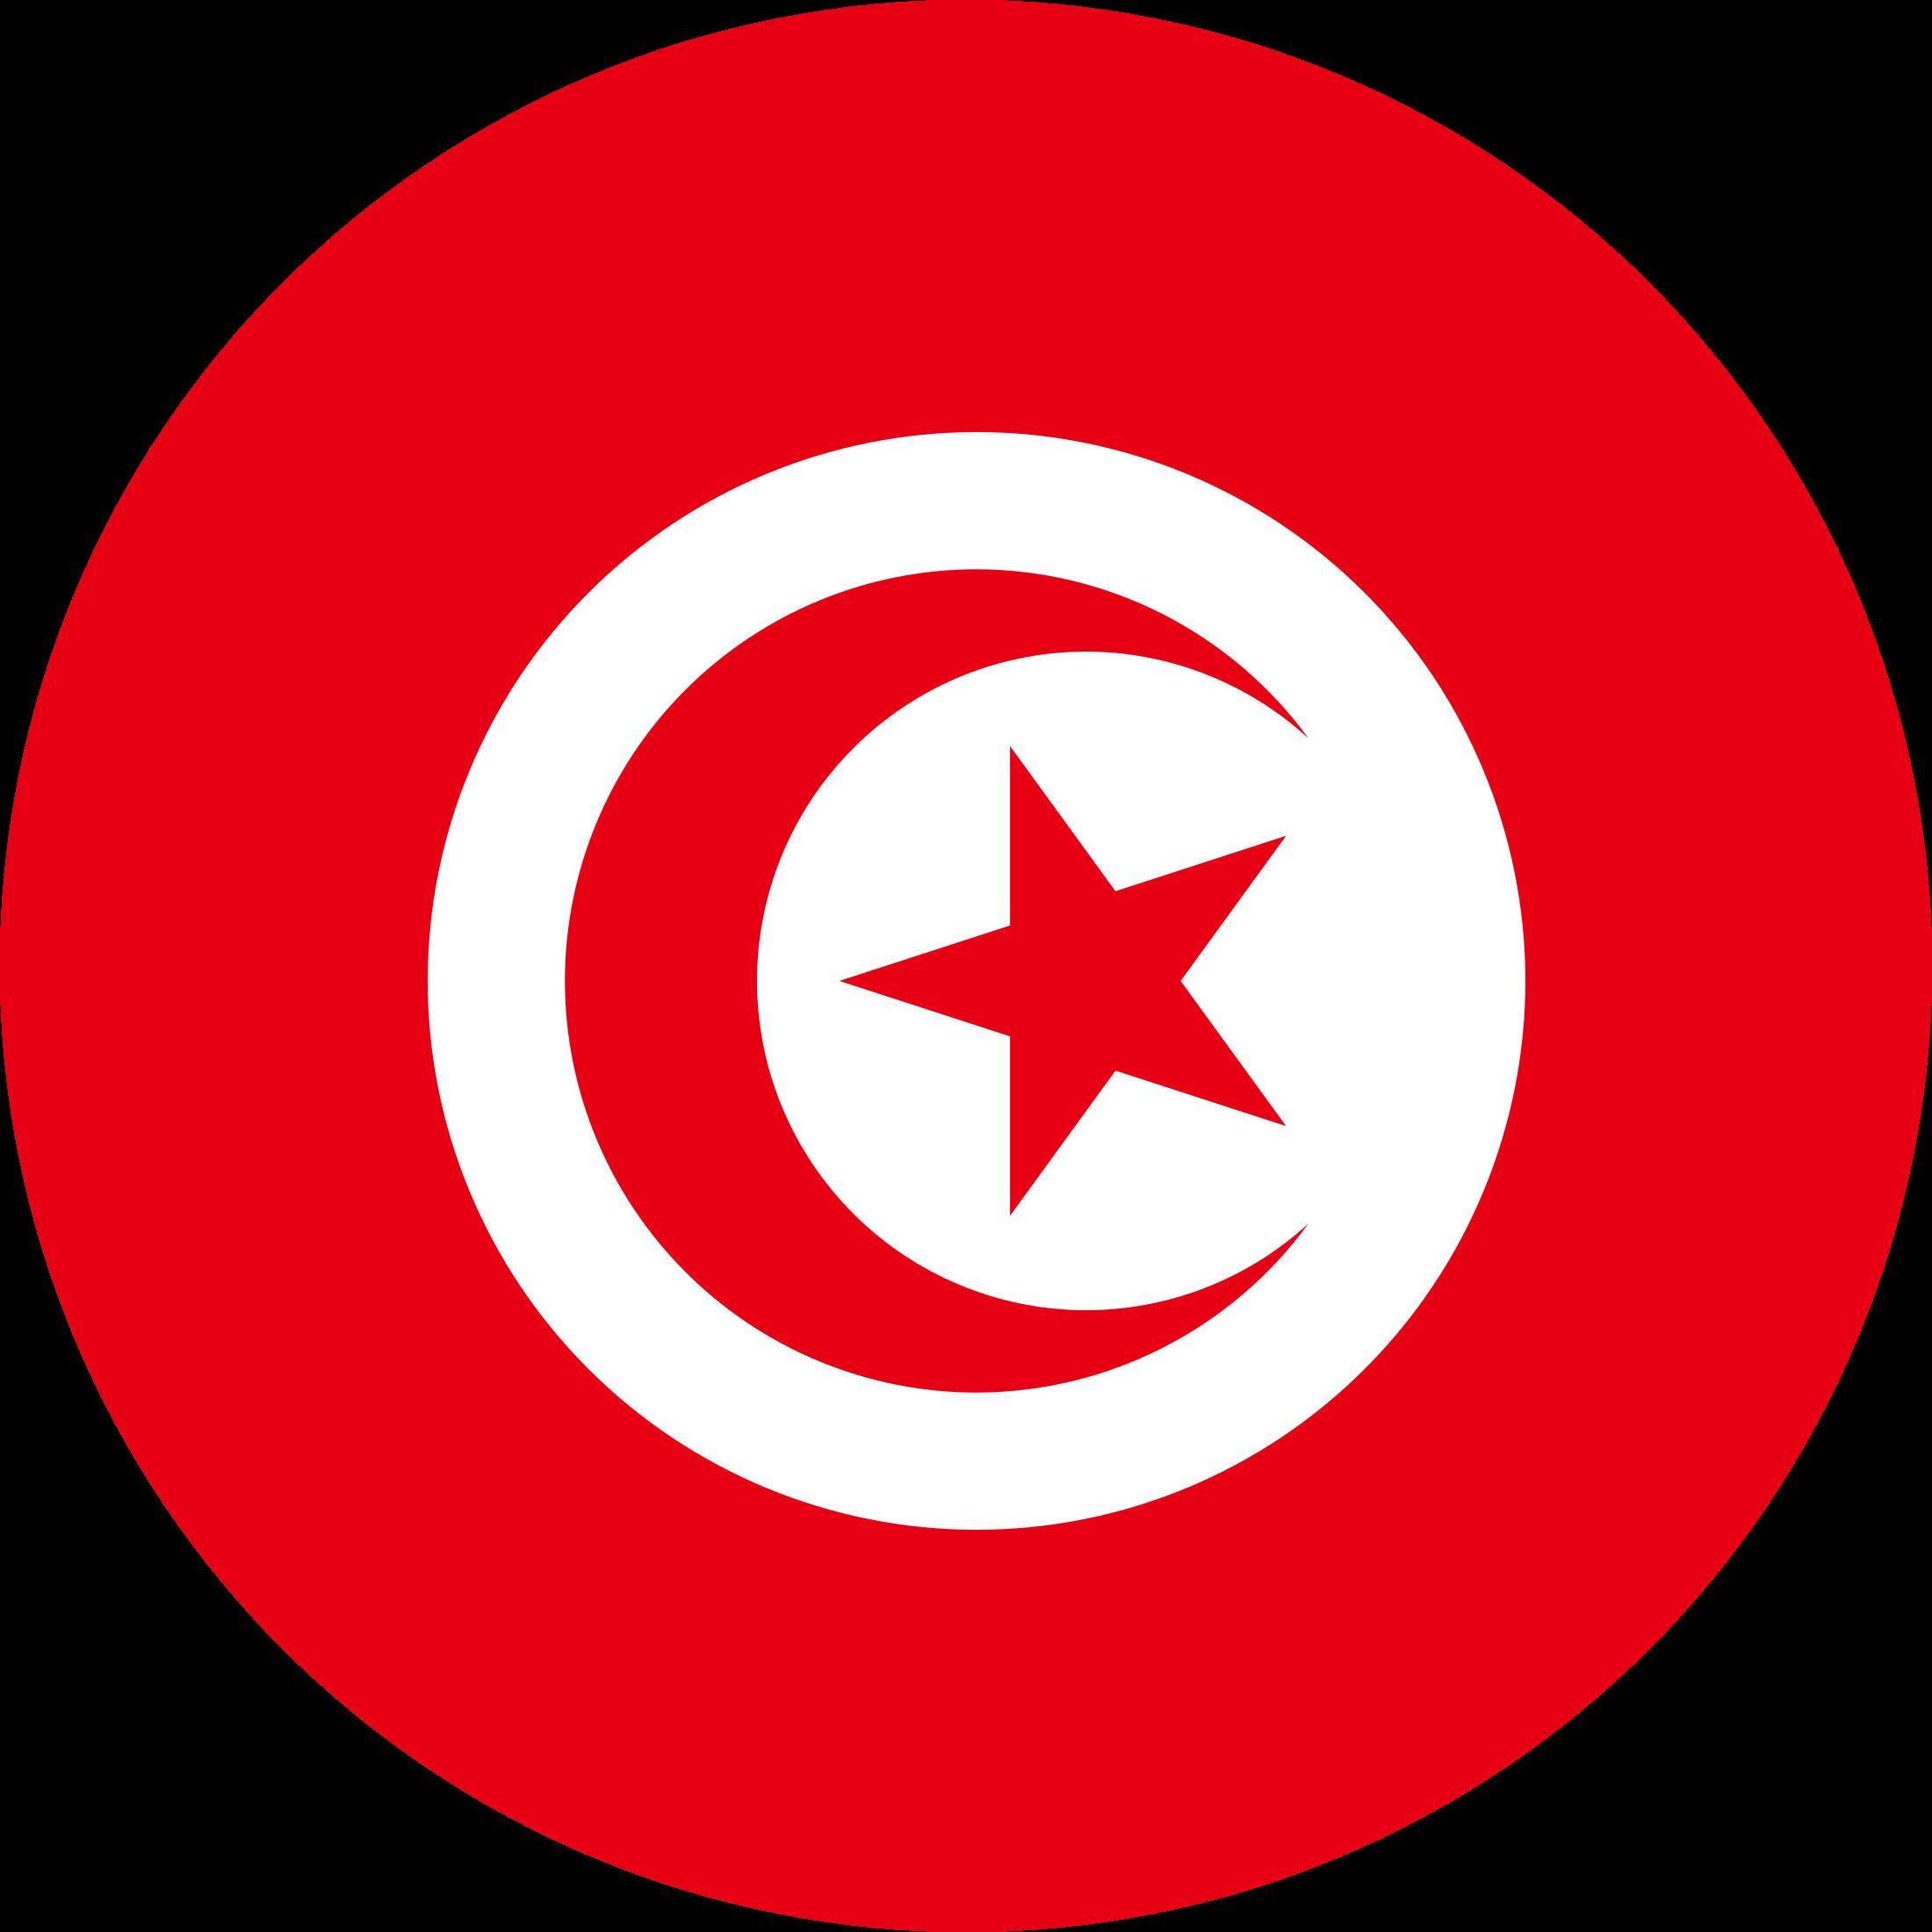 Tunisia Flag Emoji